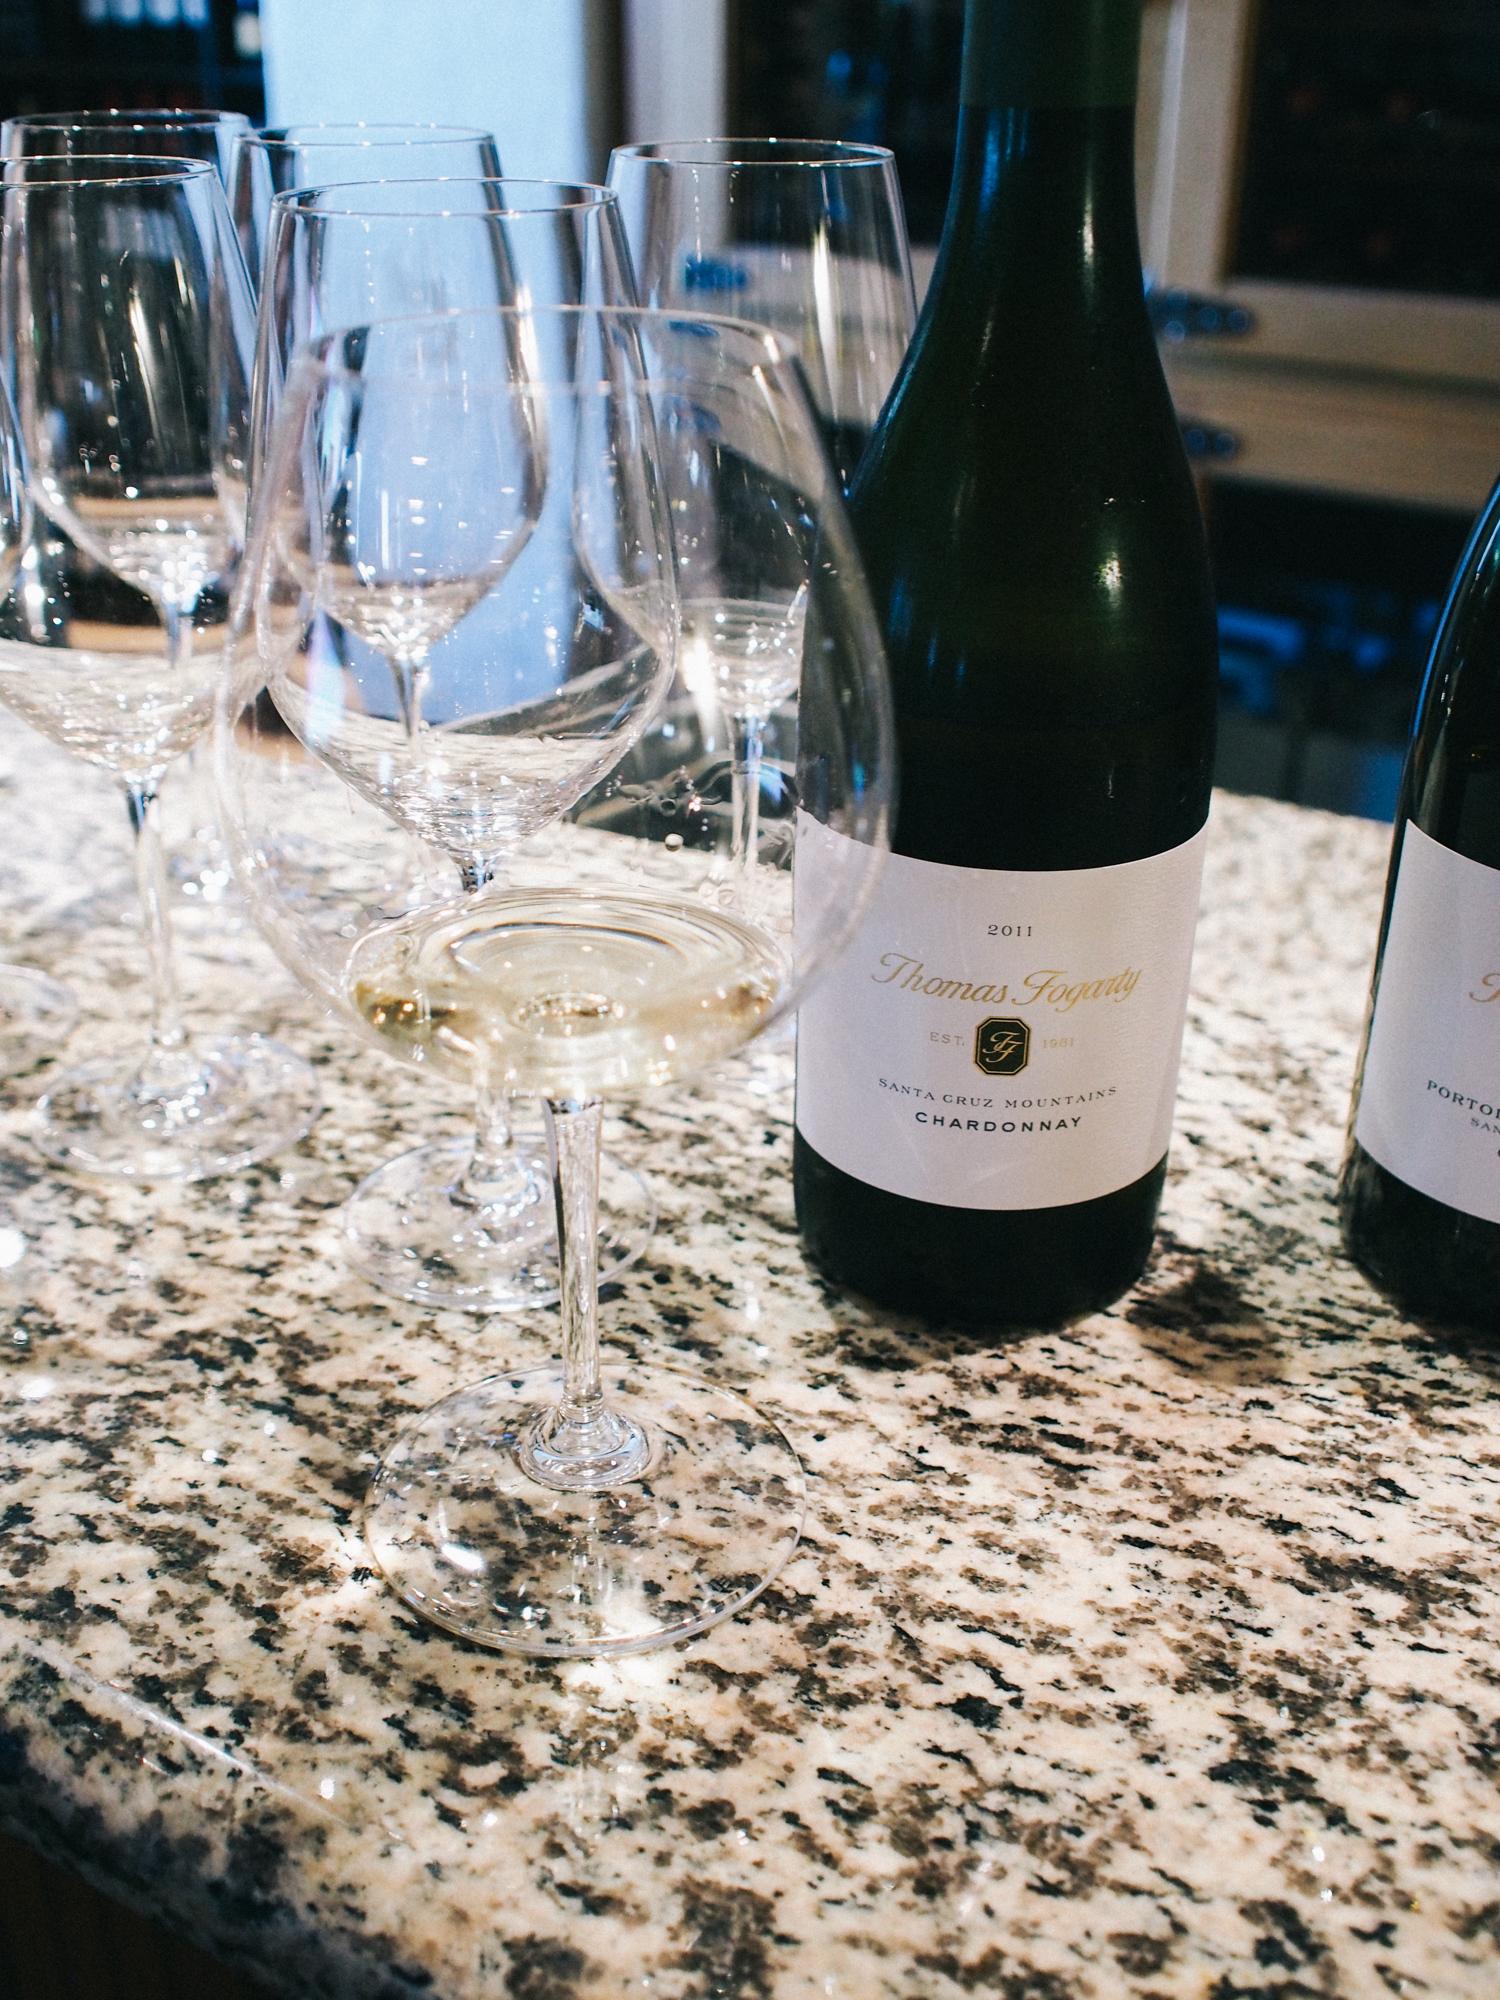 Thomas Fogarty winery visit | A Fabulous Fete